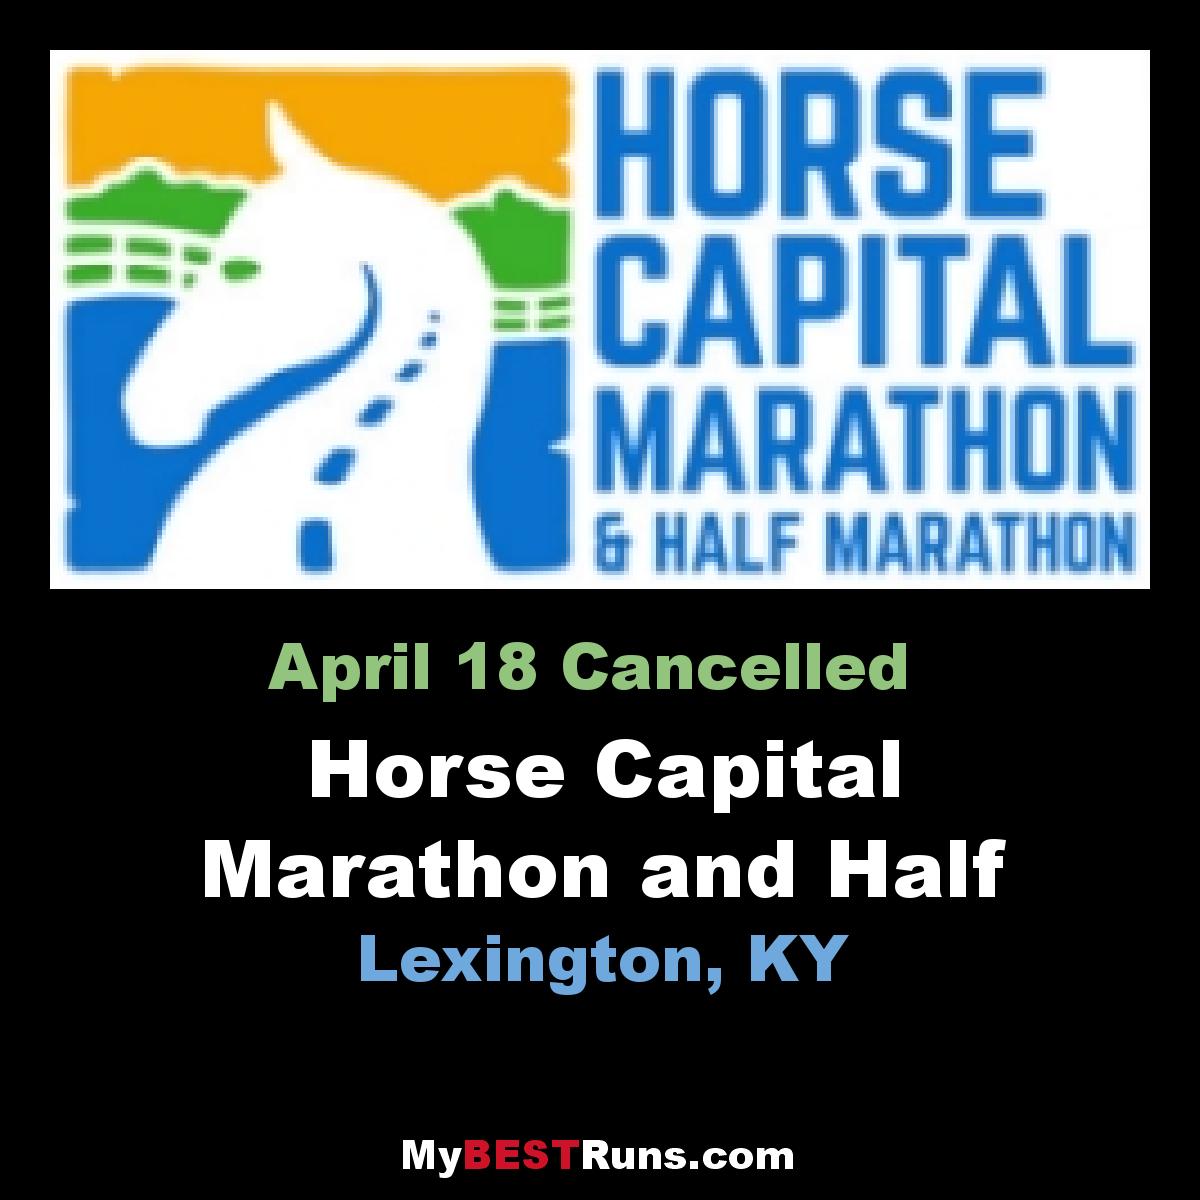 Horse Capital Marathon and Half Marathon